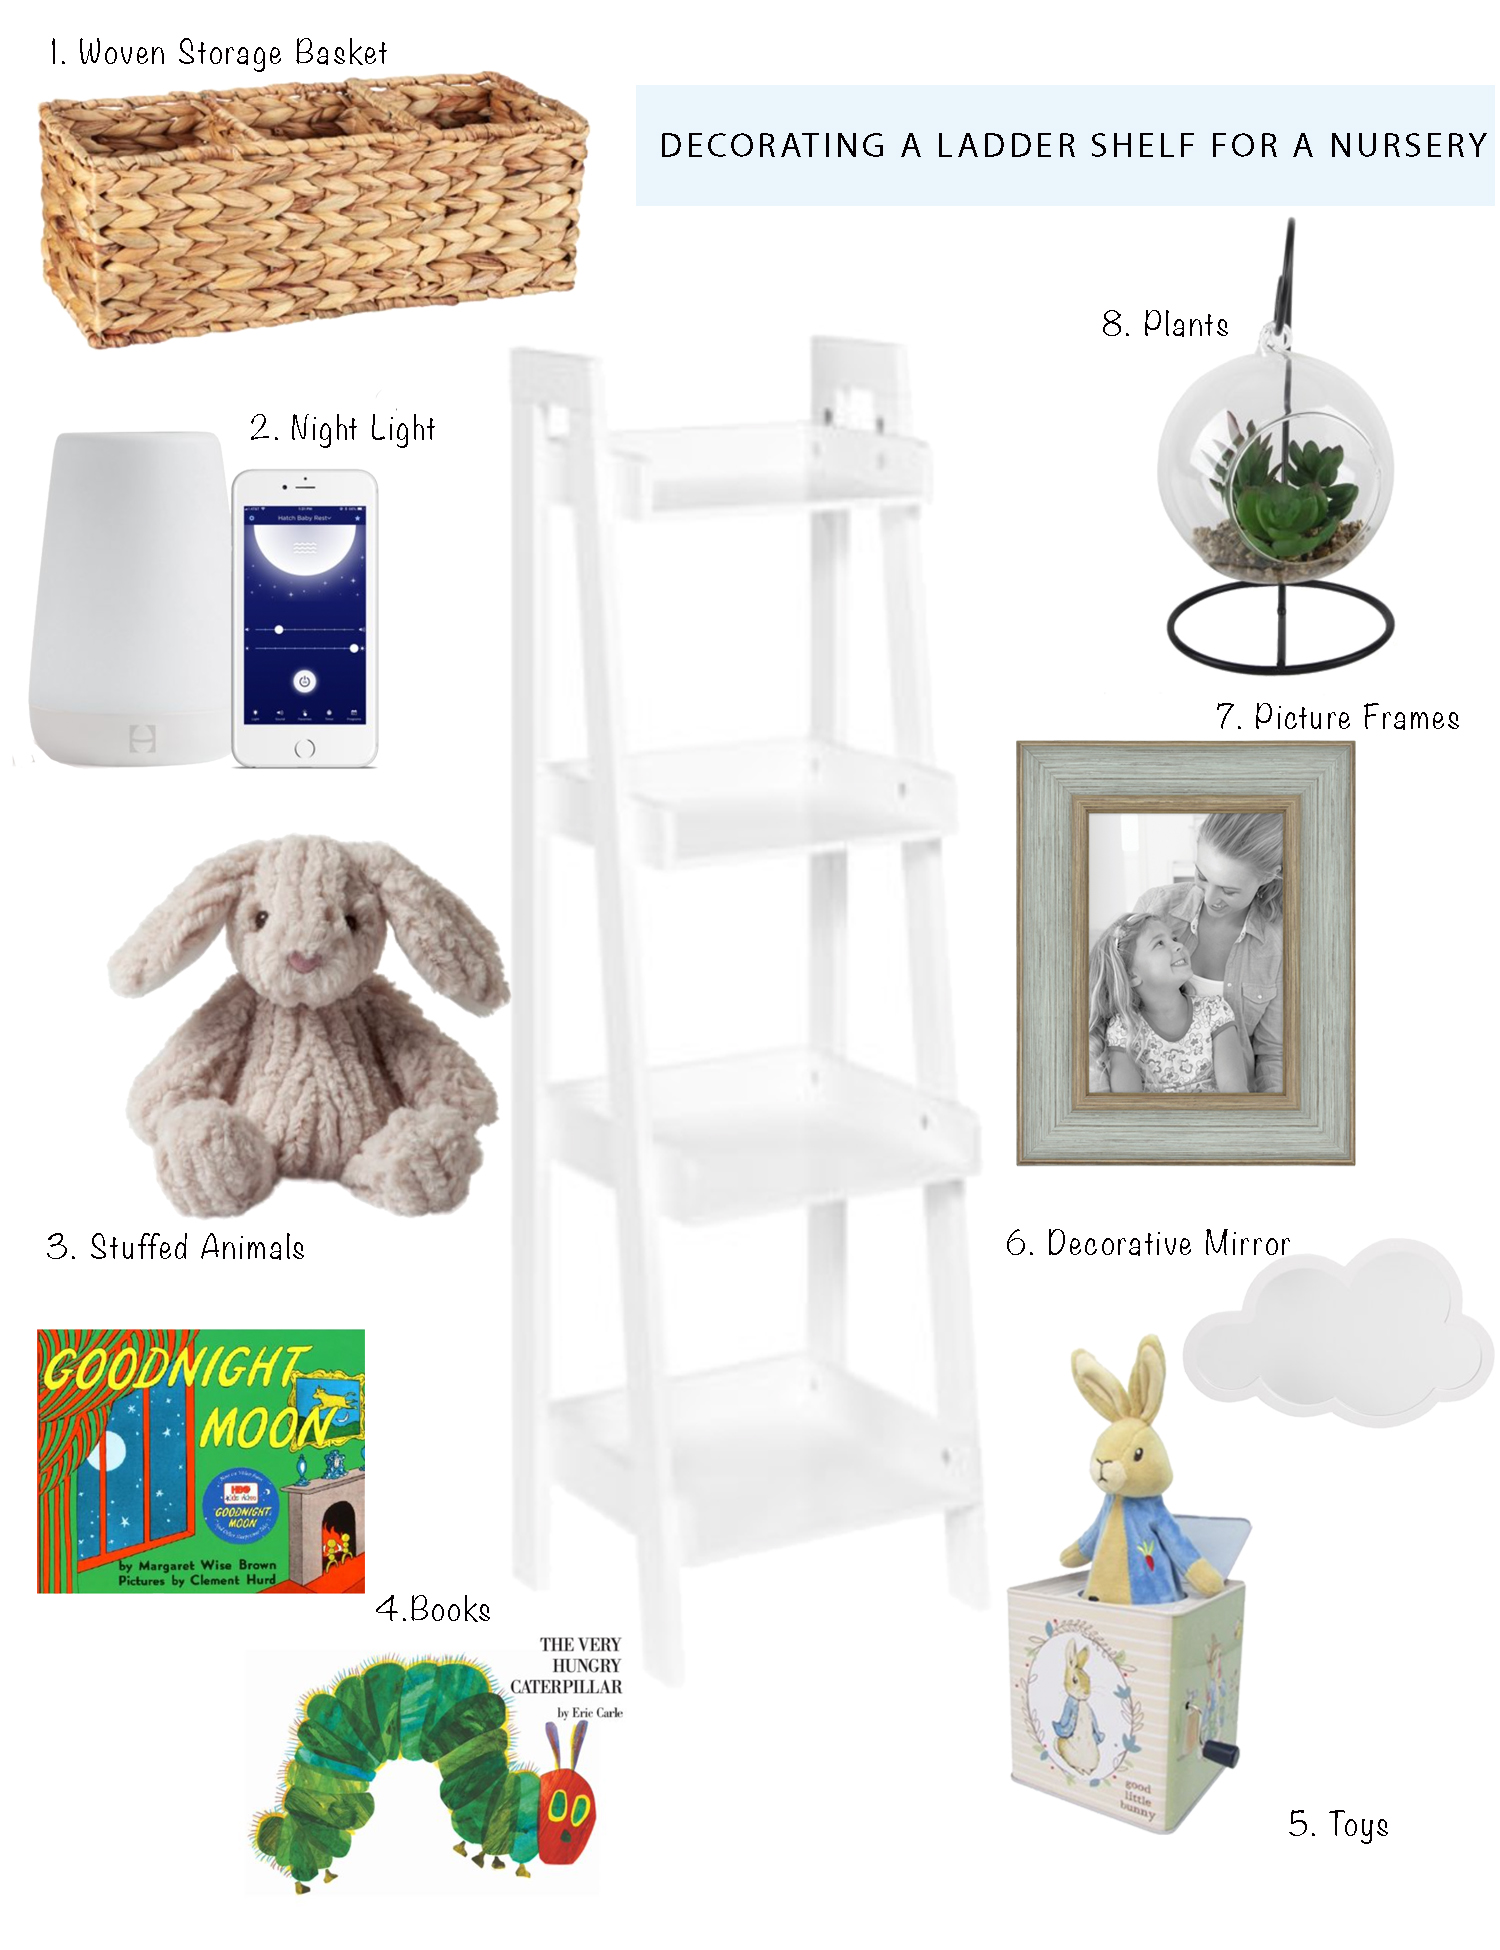 walmart-next-day-shipping-nursery-decor-baby-lo-murphy